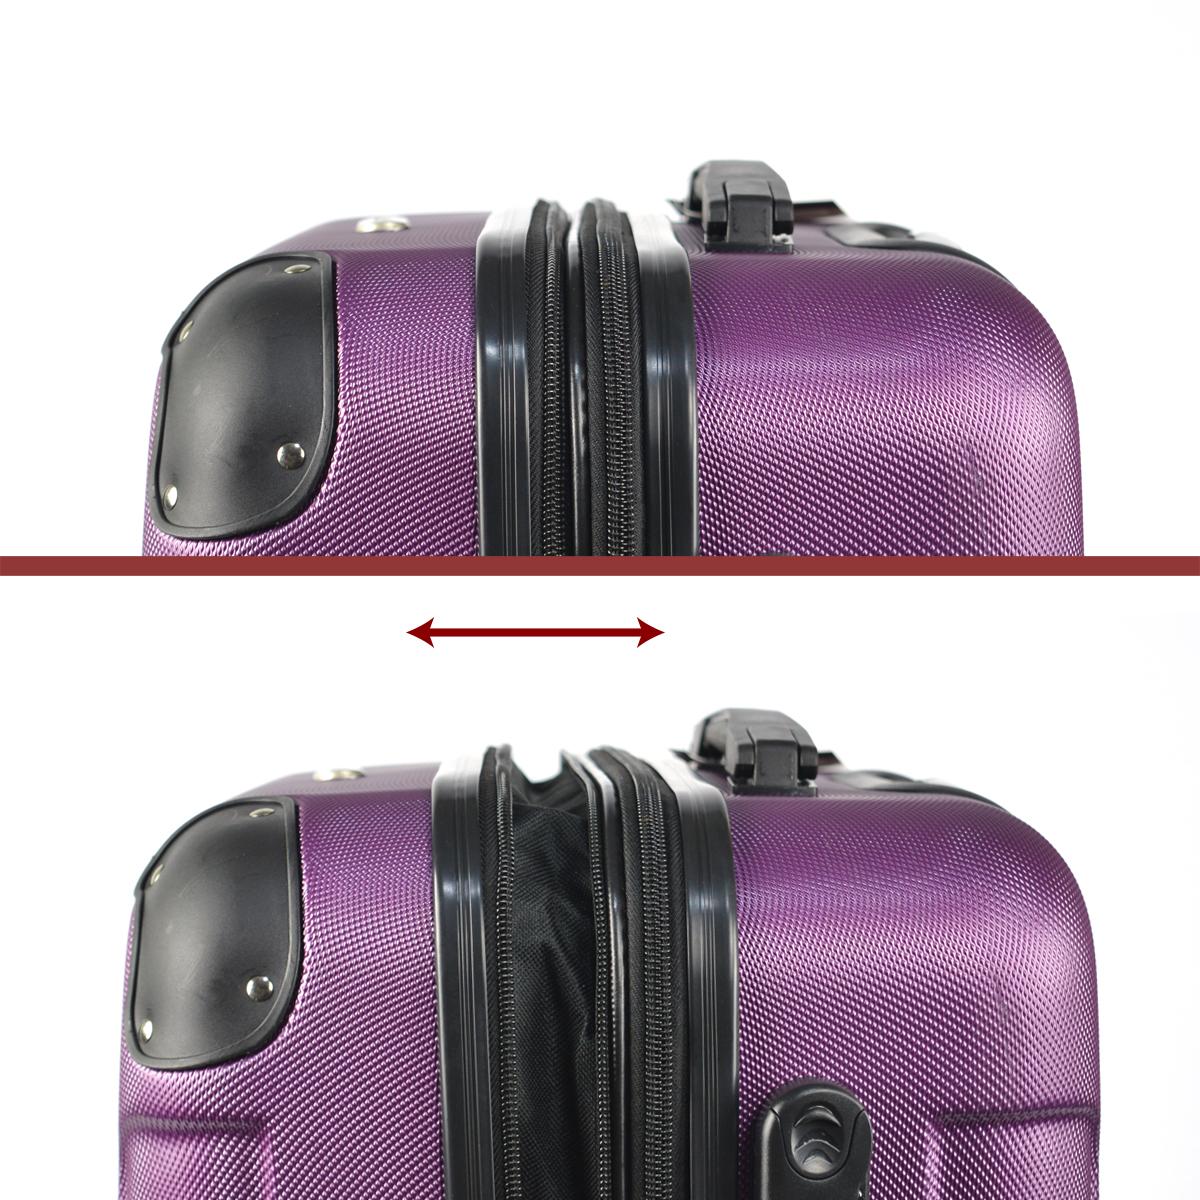 Koffer-Flexot-2045-Hartschalenkoffer-Trolley-Kofferset-Reisekoffer-M-L-XL-Set Indexbild 92